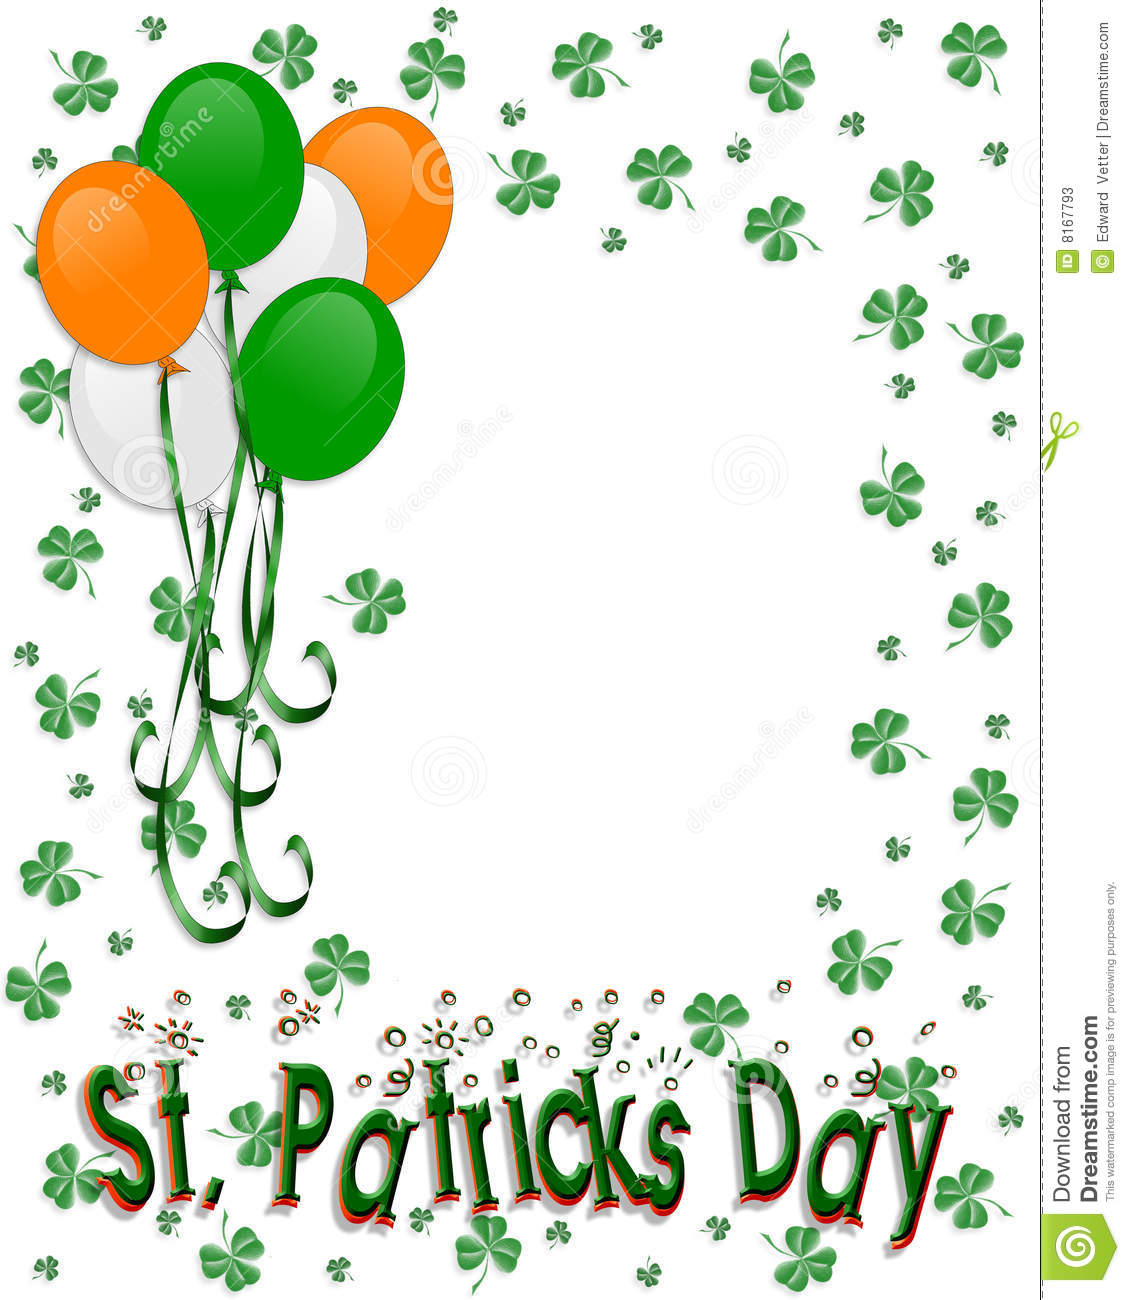 St Patrick's Day Border Balloons Stock Illustration.